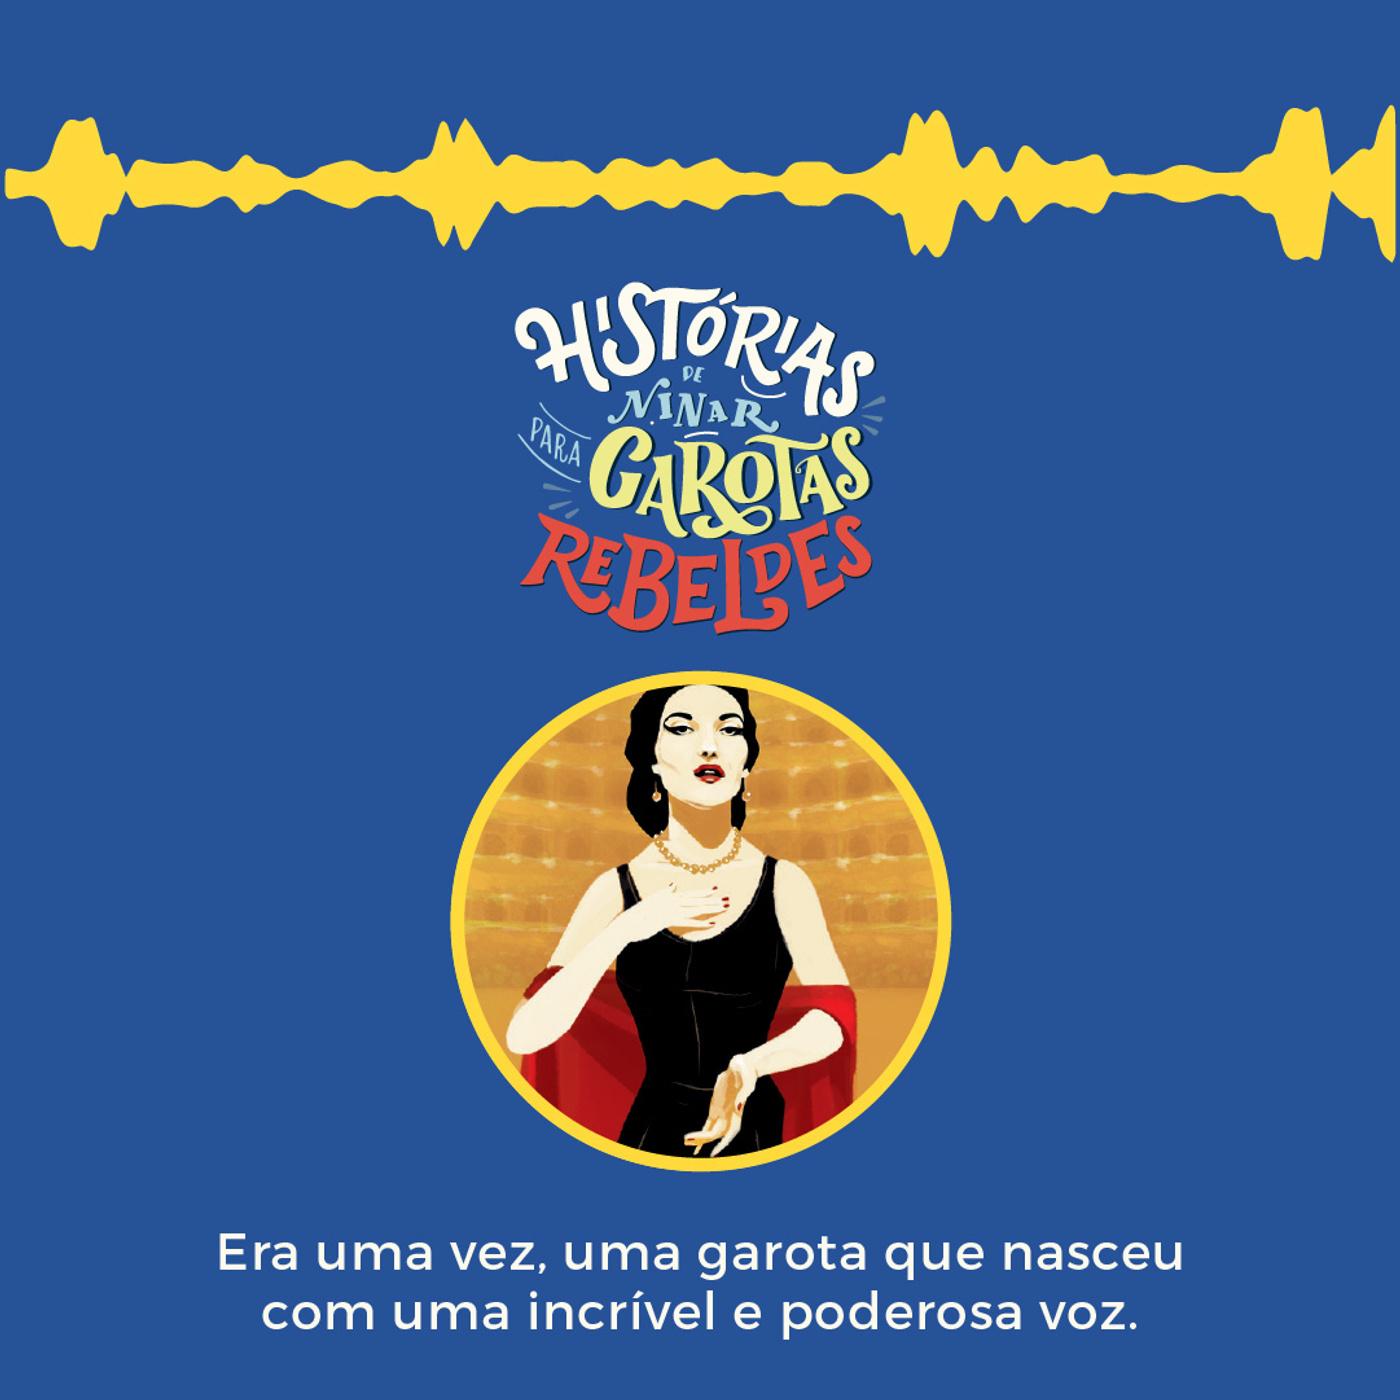 Maria Callas, lido por Daniela Mercury